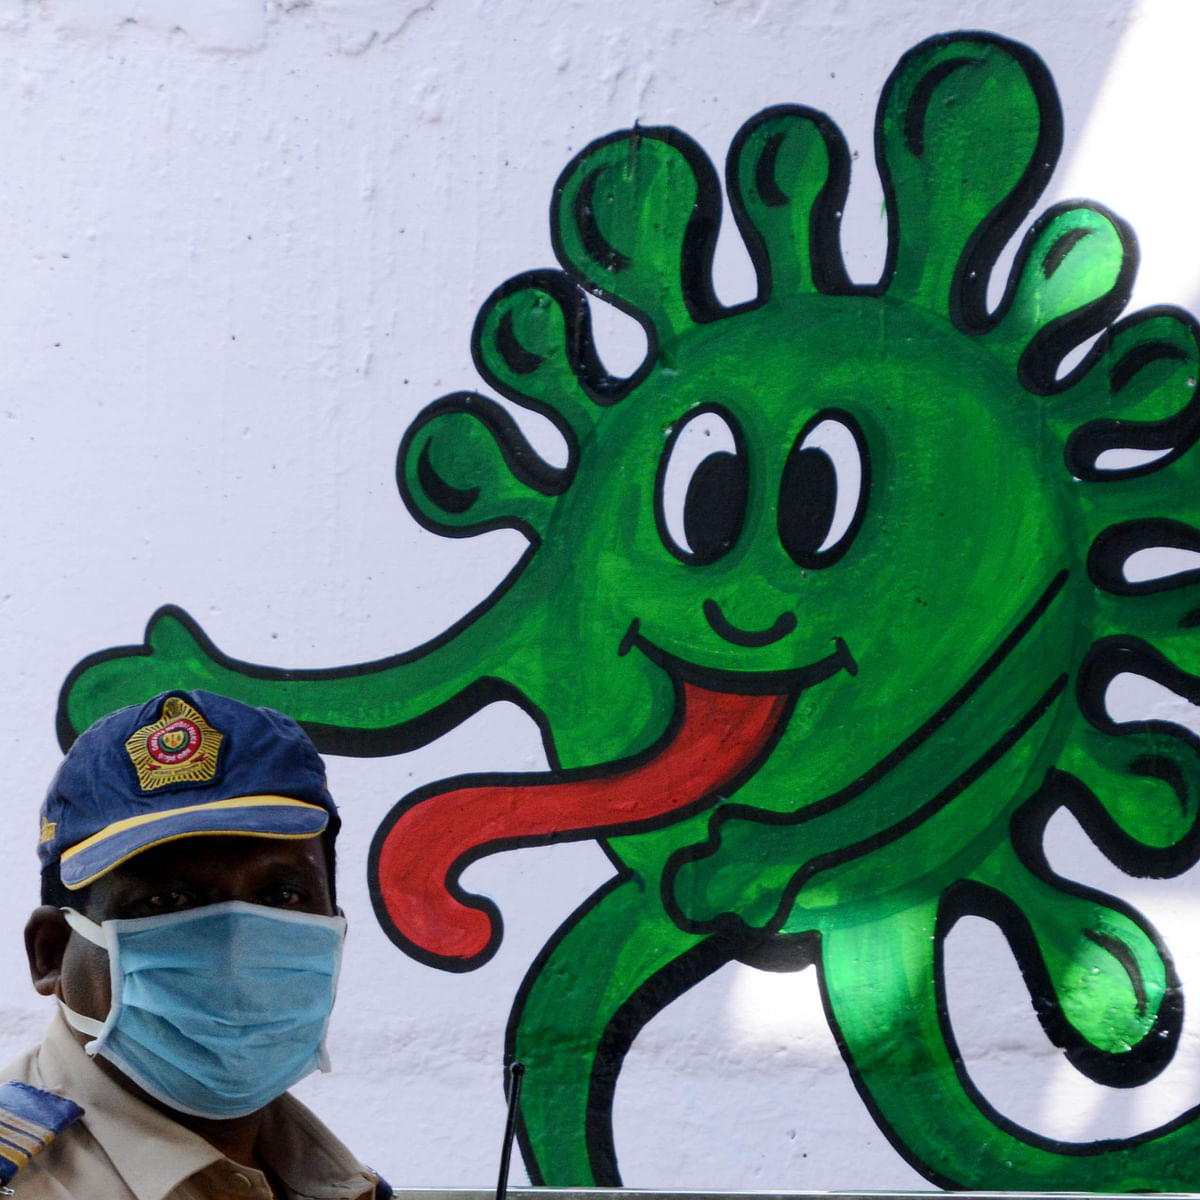 In Pics: Mumbai under coronavirus lockdown -- here's how the city looked on Friday